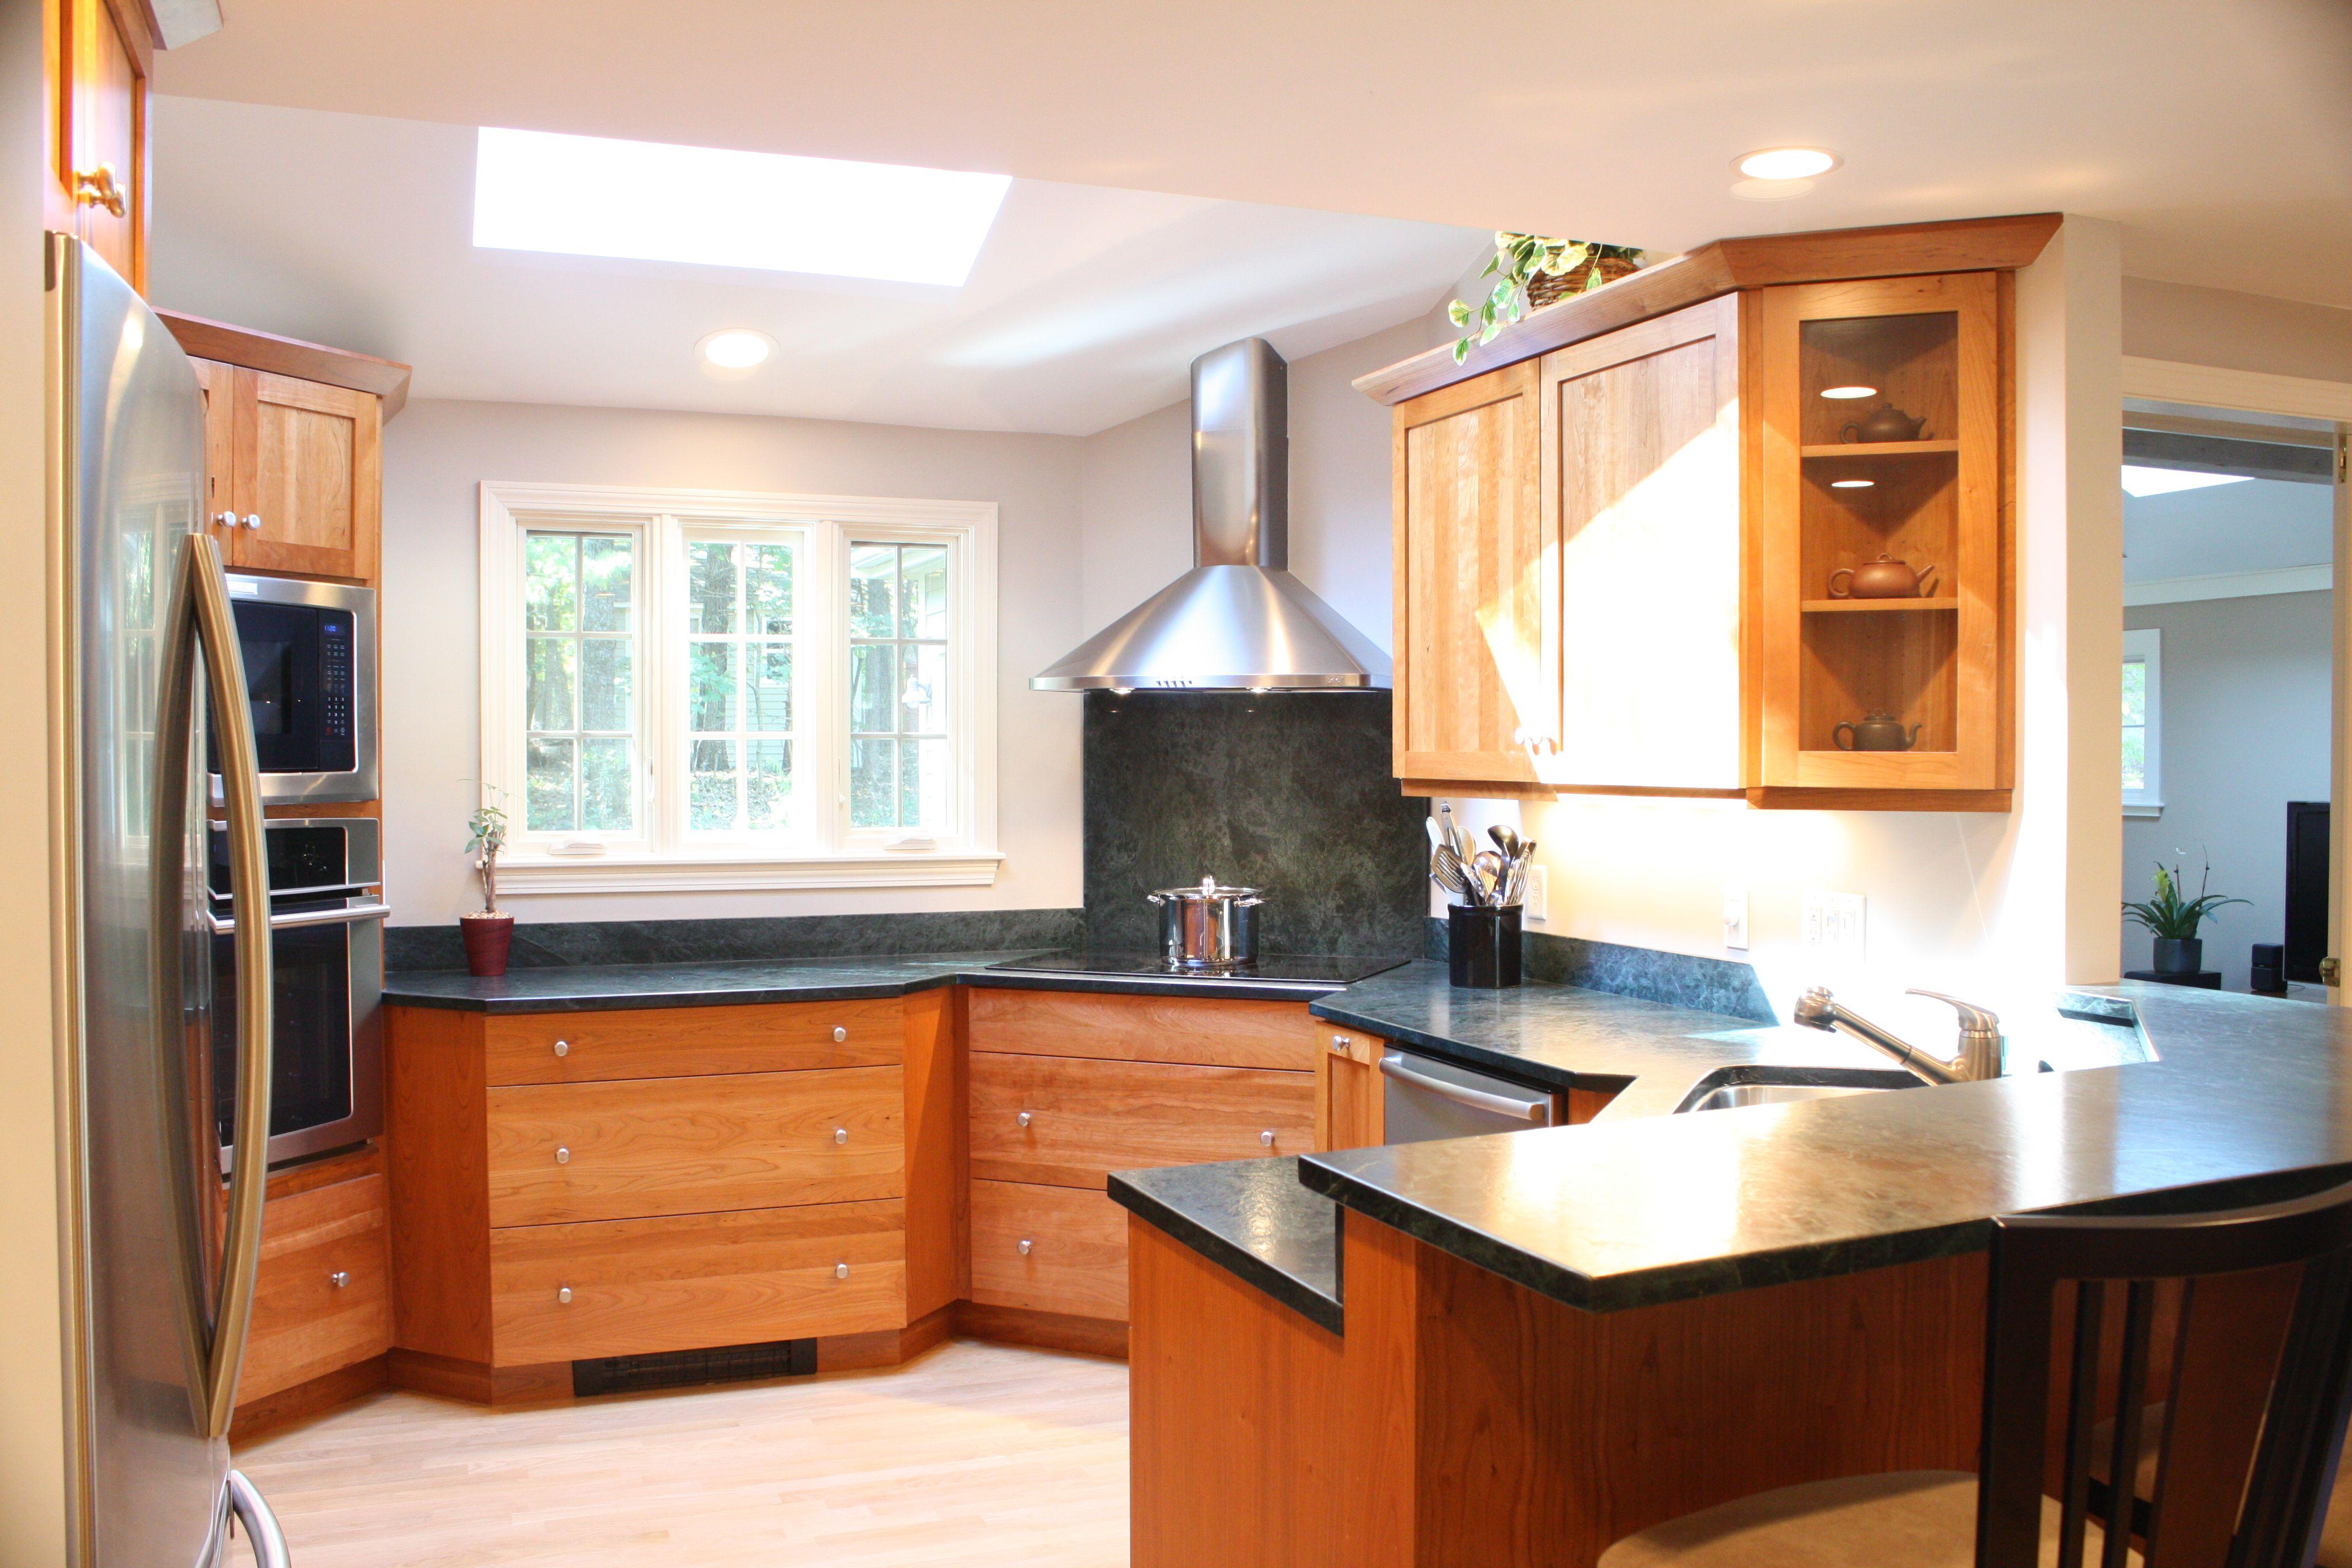 Cherry Wood Cabinet Kitchens Stainless steel appliances corner